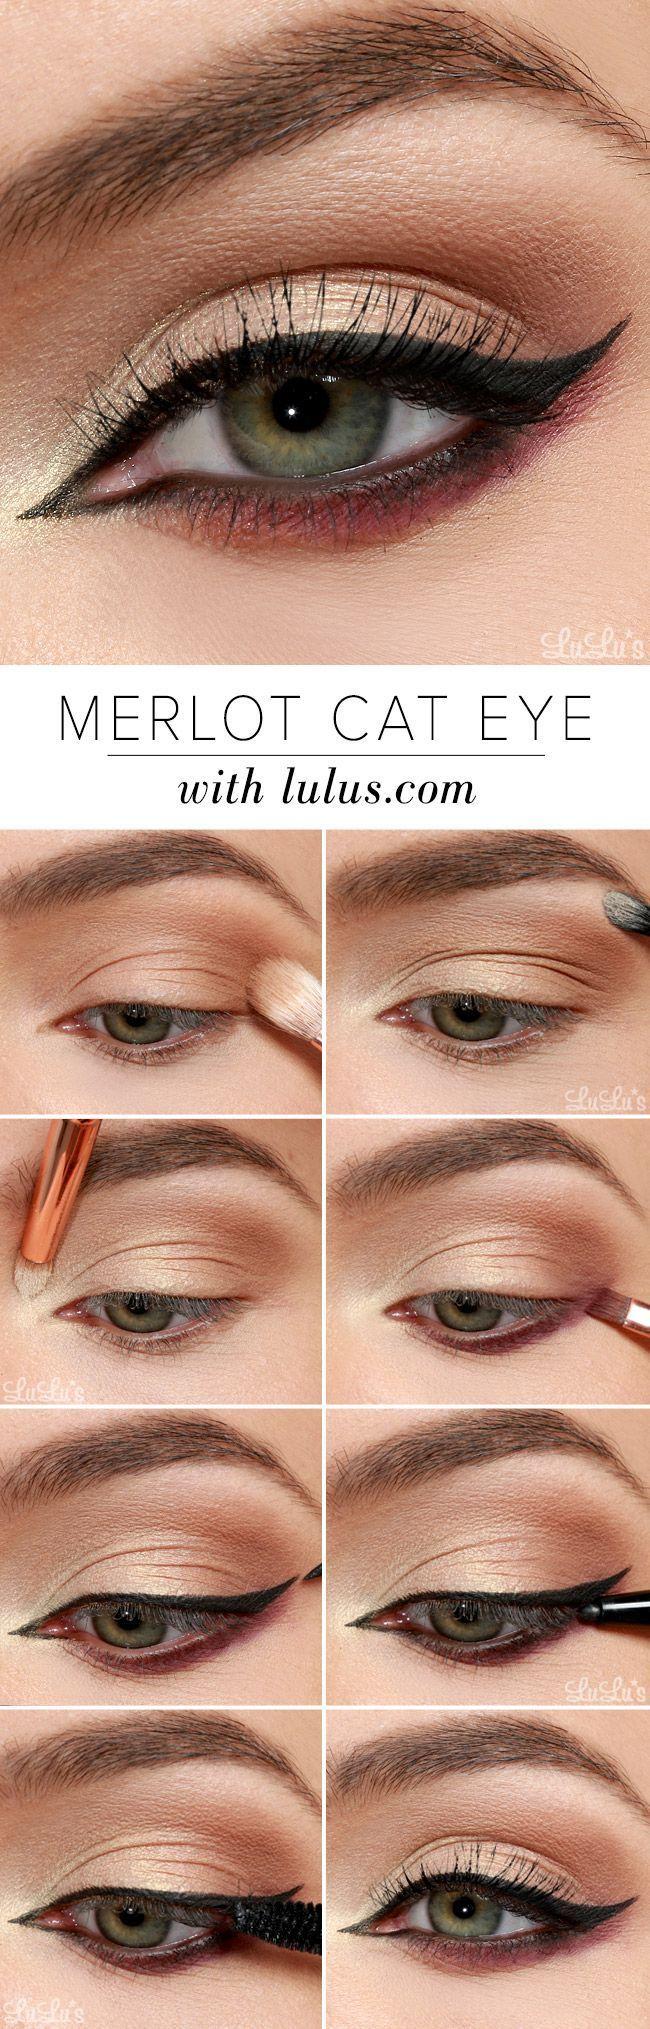 Best Ideas For Makeup Tutorials    Picture    Description  LuLu*s How-To: Merlot Cat Eye Makeup Tutorial at LuLus.com!    - #Makeup https://glamfashion.net/beauty/make-up/best-ideas-for-makeup-tutorials-lulus-how-to-merlot-cat-eye-makeup-tutorial-at-lulus-com-4/